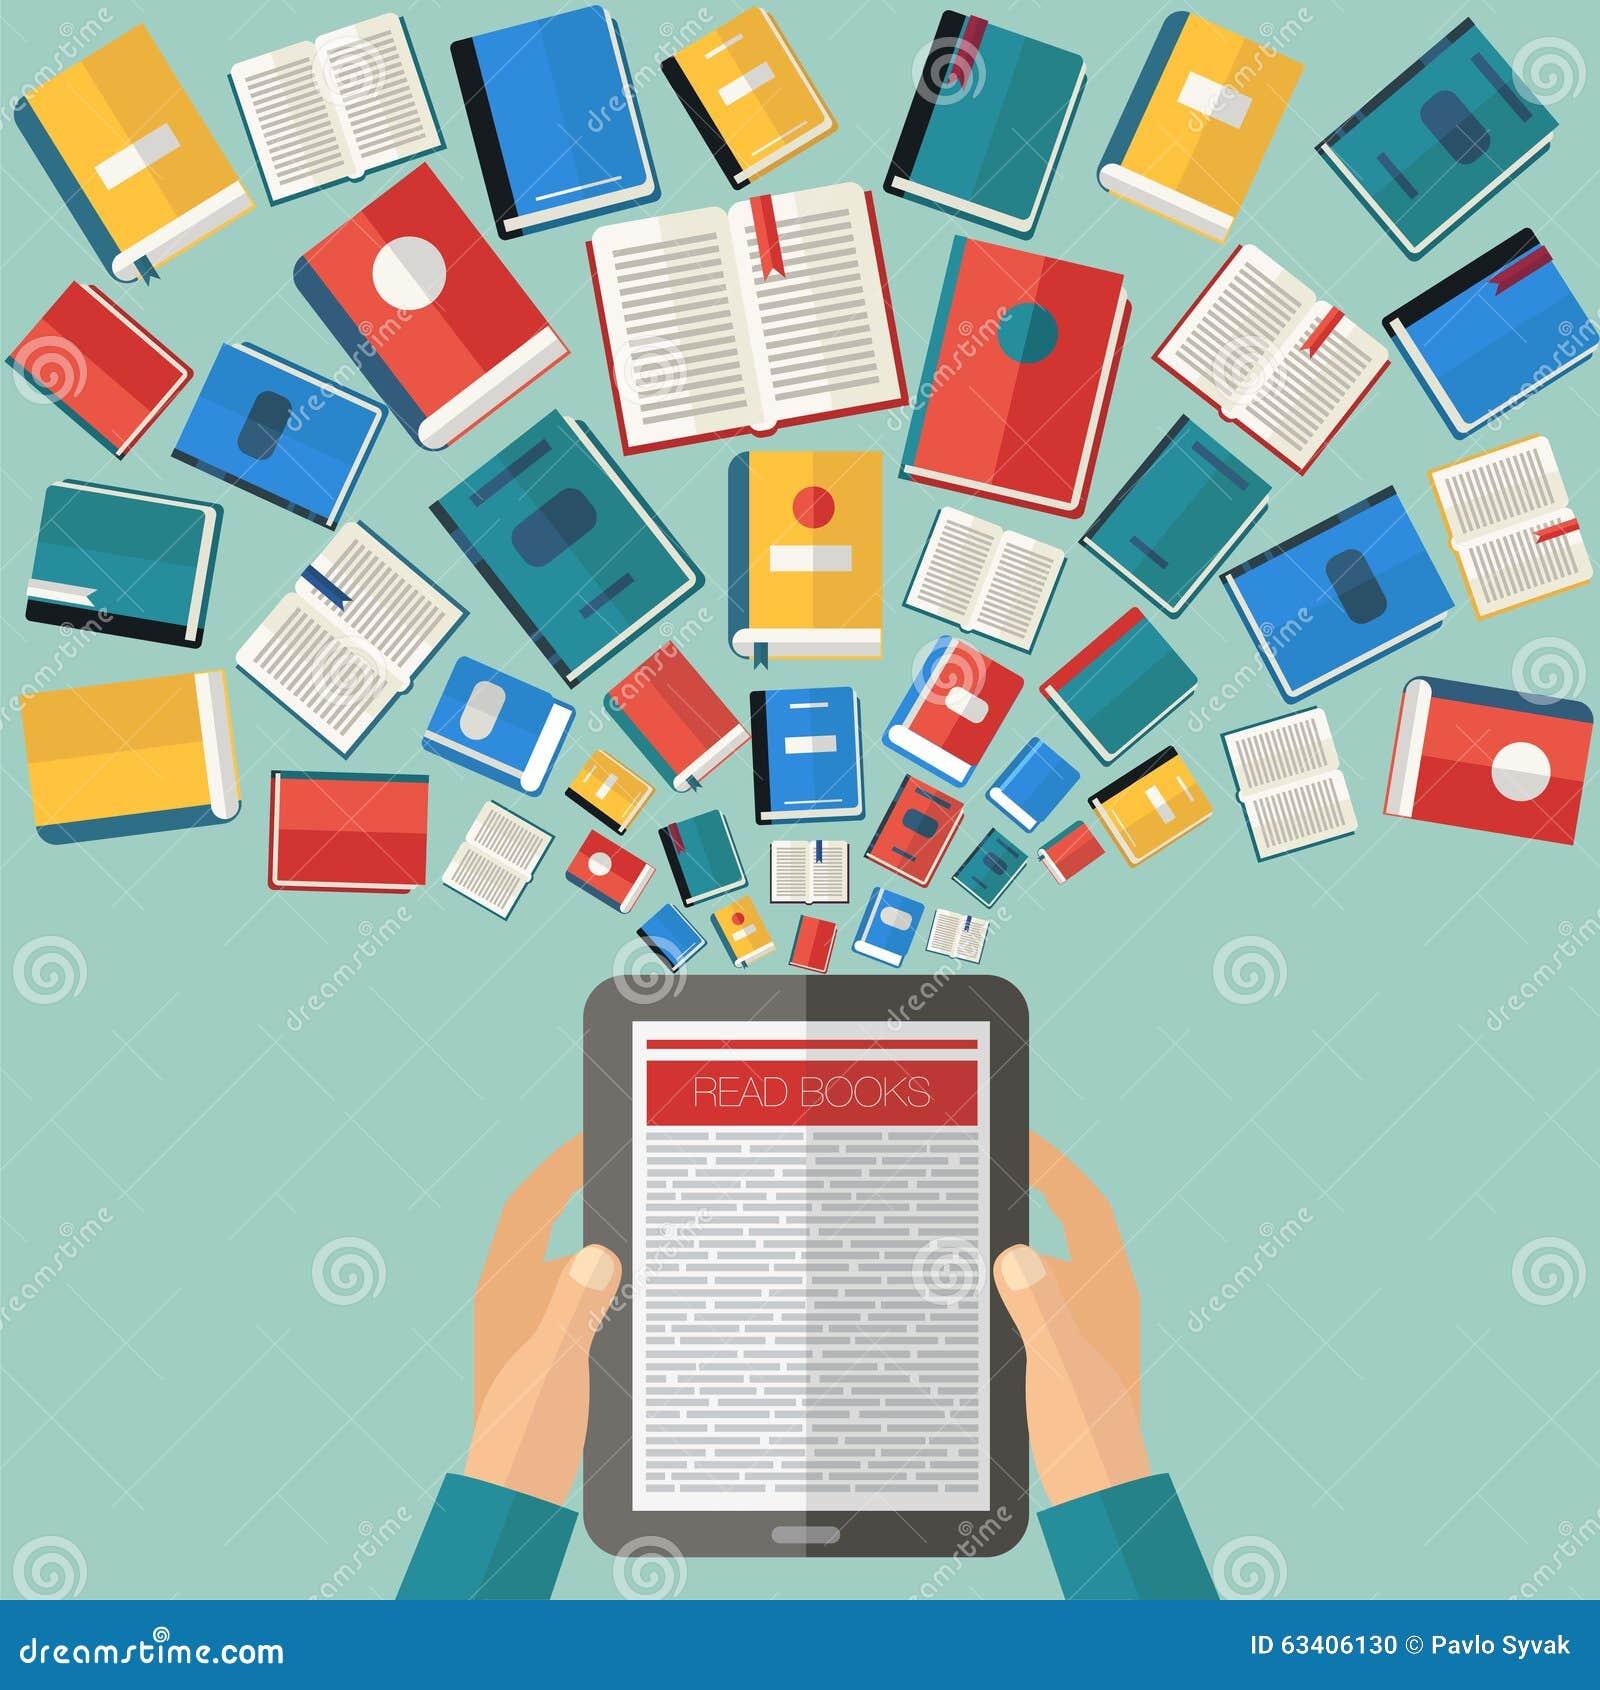 Creative Book Design Vector : Reading books background stock vector image